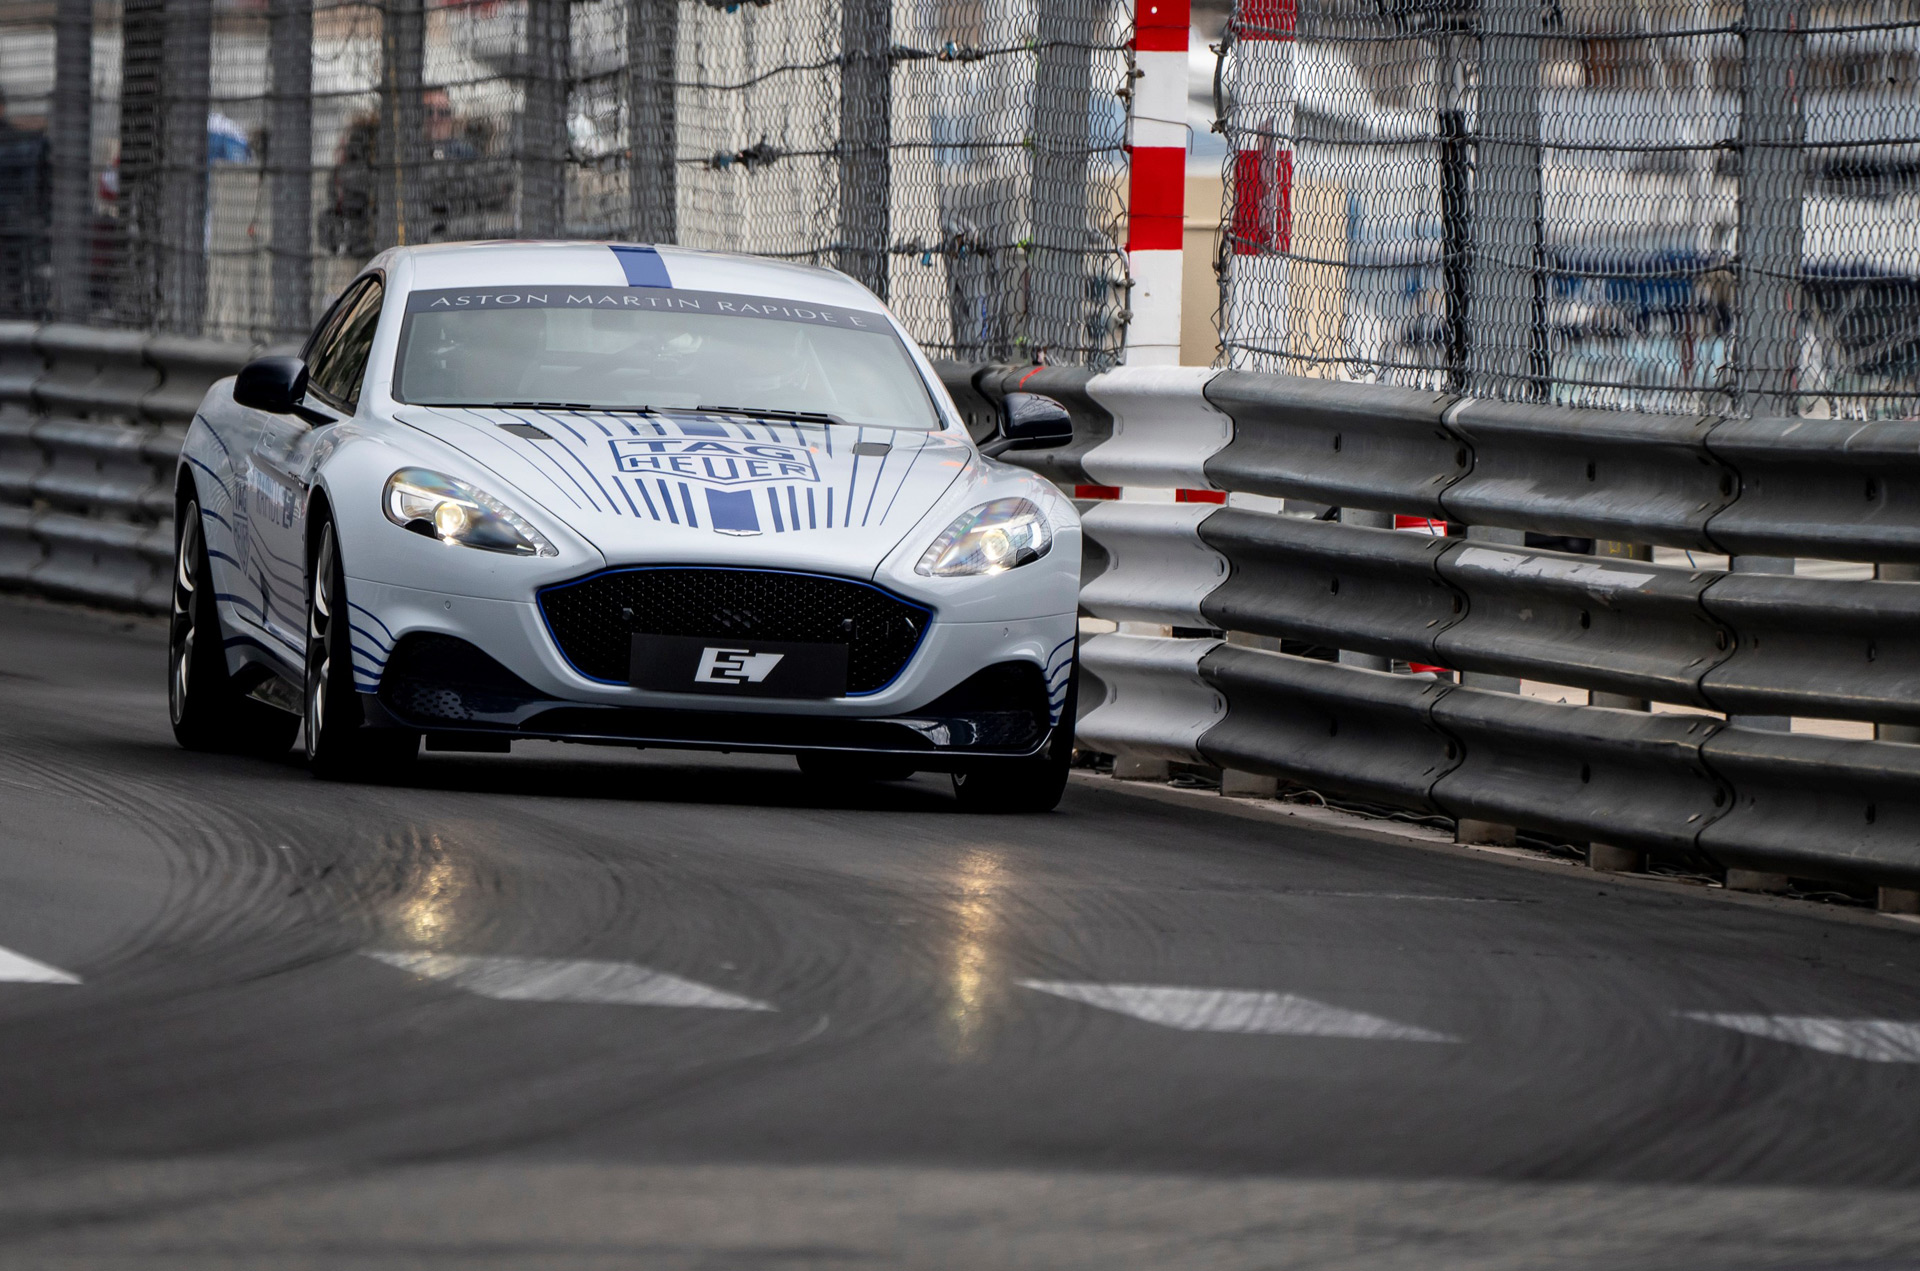 Aston Martin Rapide E Makes First Public Appearance At Monaco E